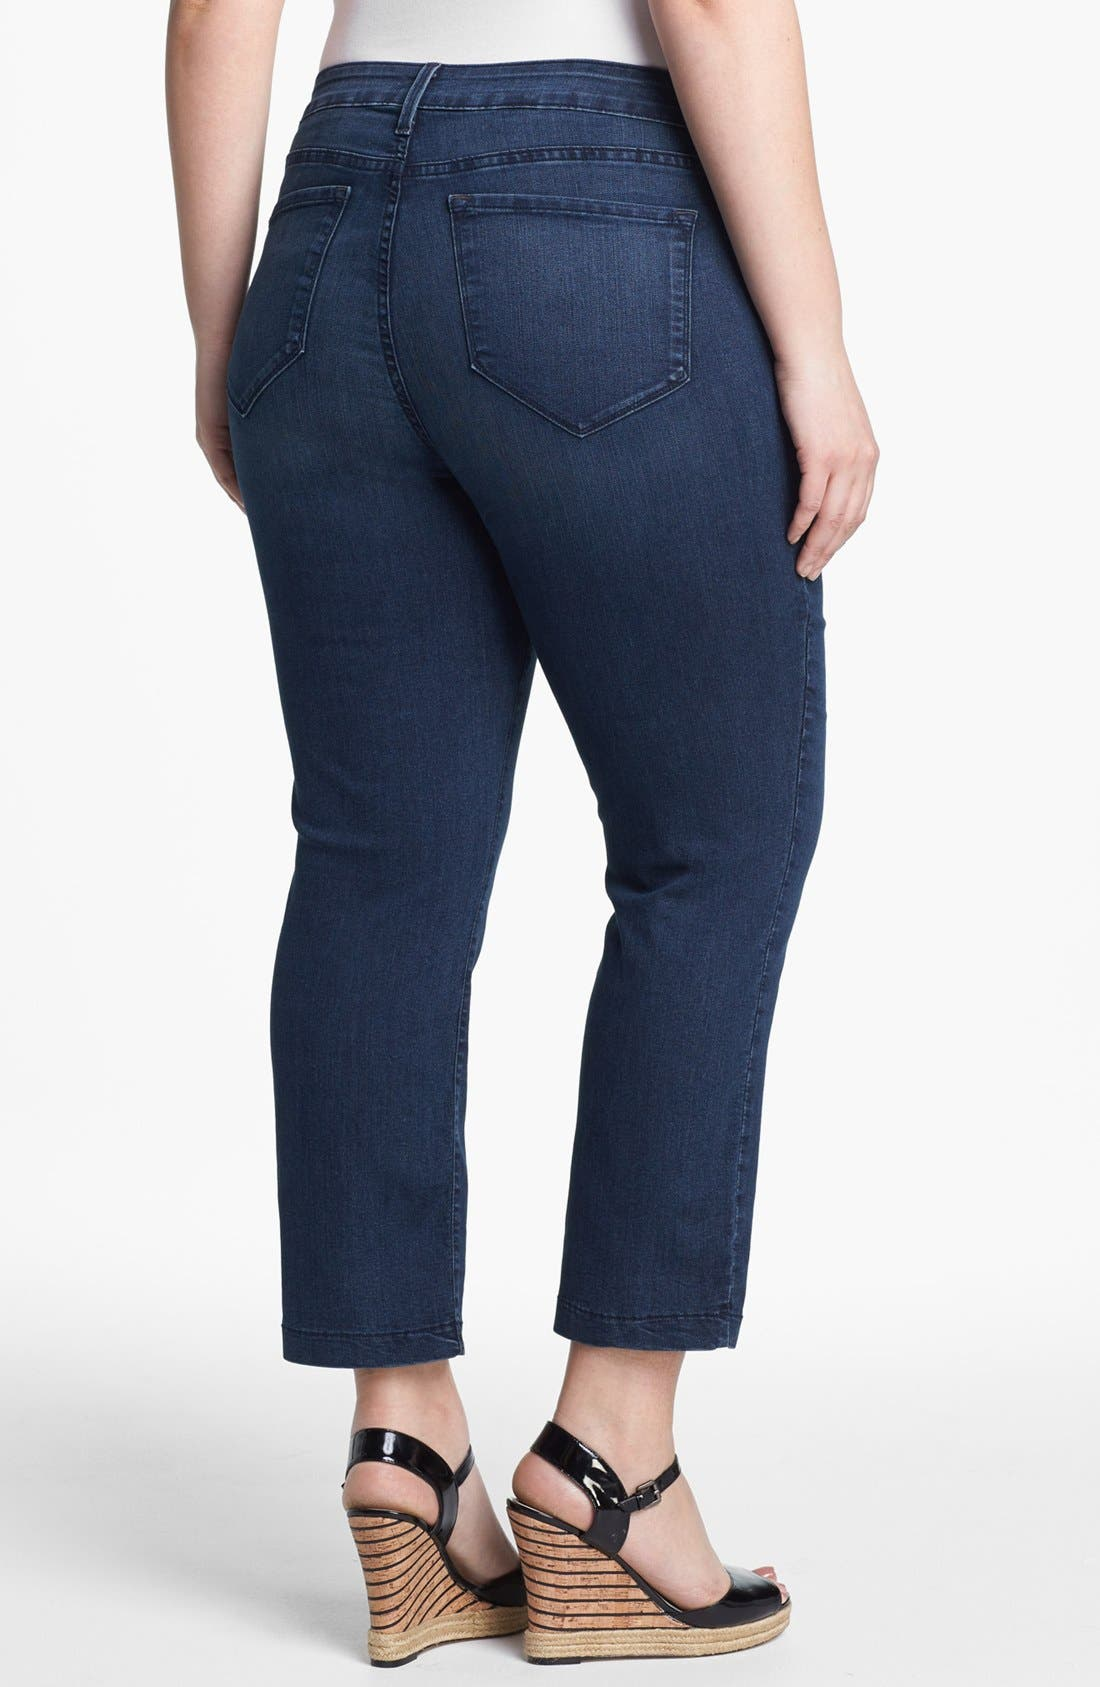 Alternate Image 2  - NYDJ 'Audrey' Stretch Ankle Skinny Jeans (New York) (Plus Size)